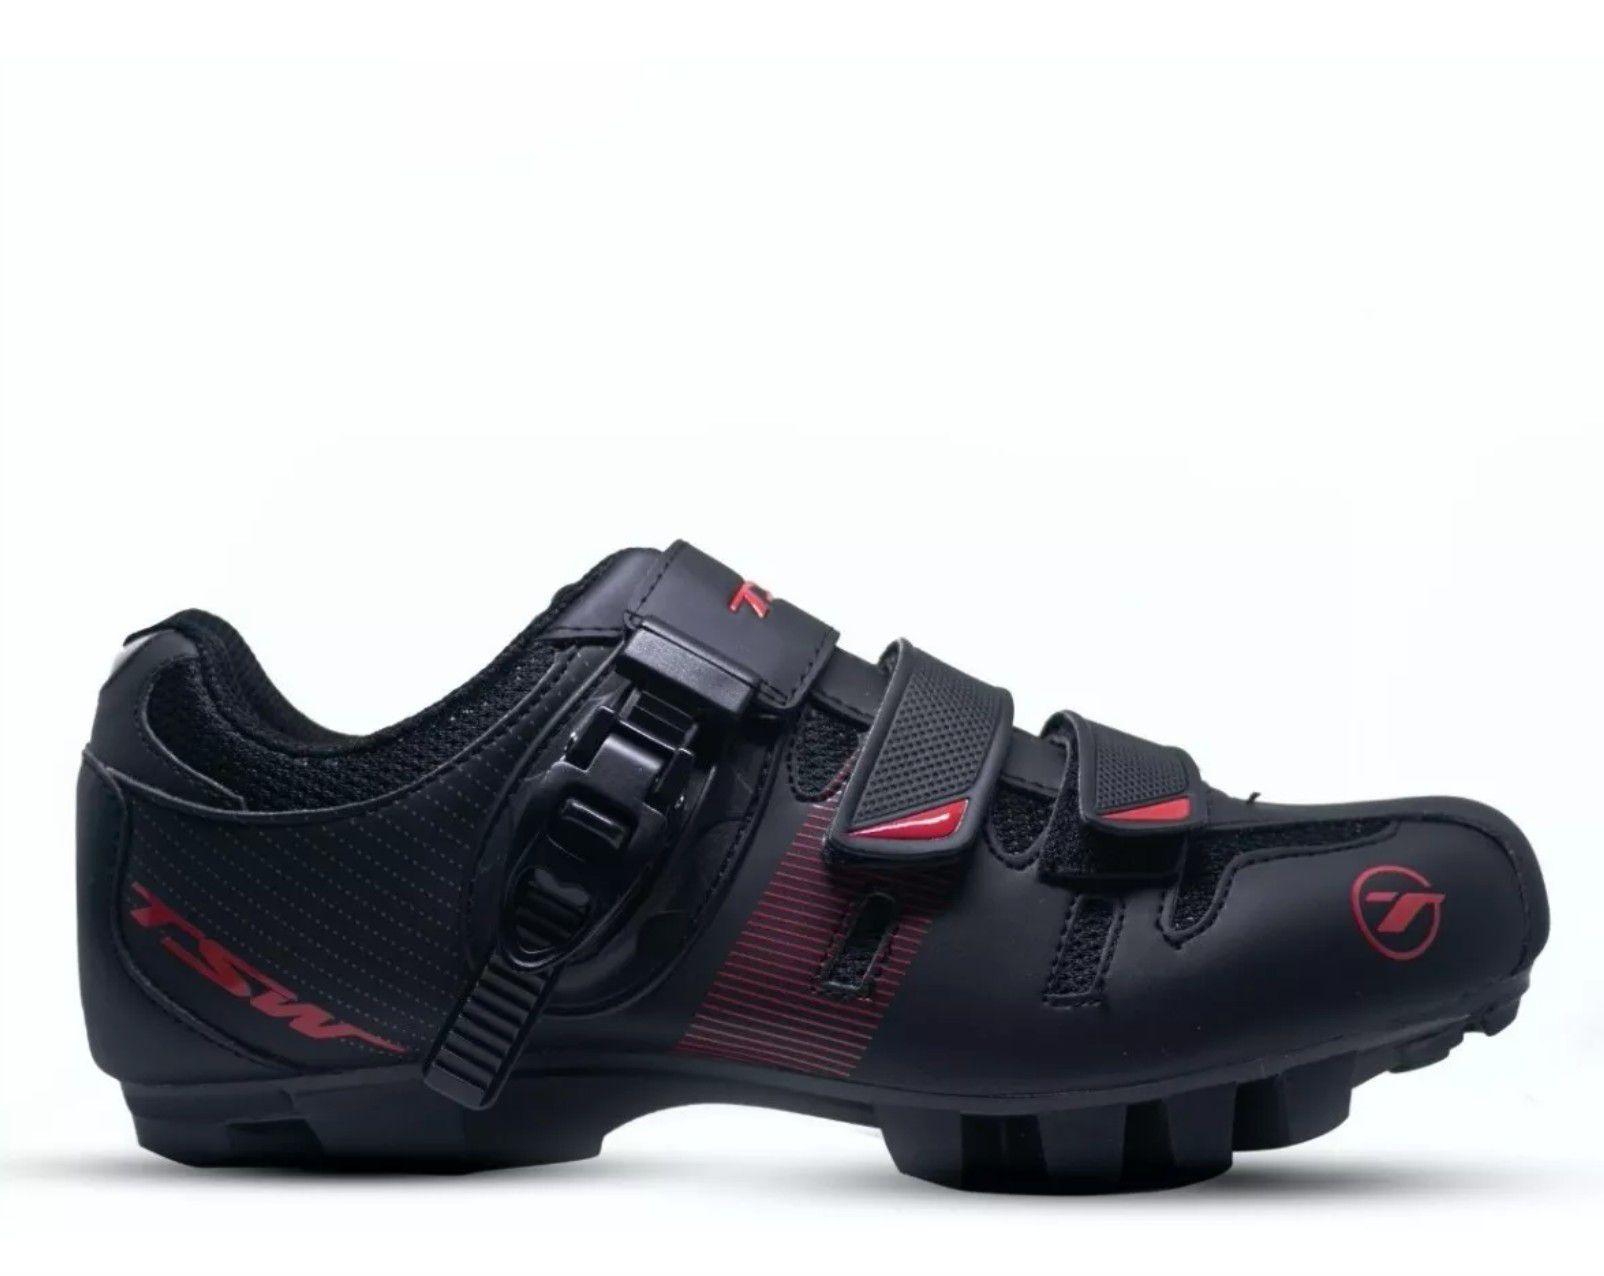 Sapatilha Tsw Cave Preta/Vermelha + Pedal Shimano M530 + Taco Clip Mtb